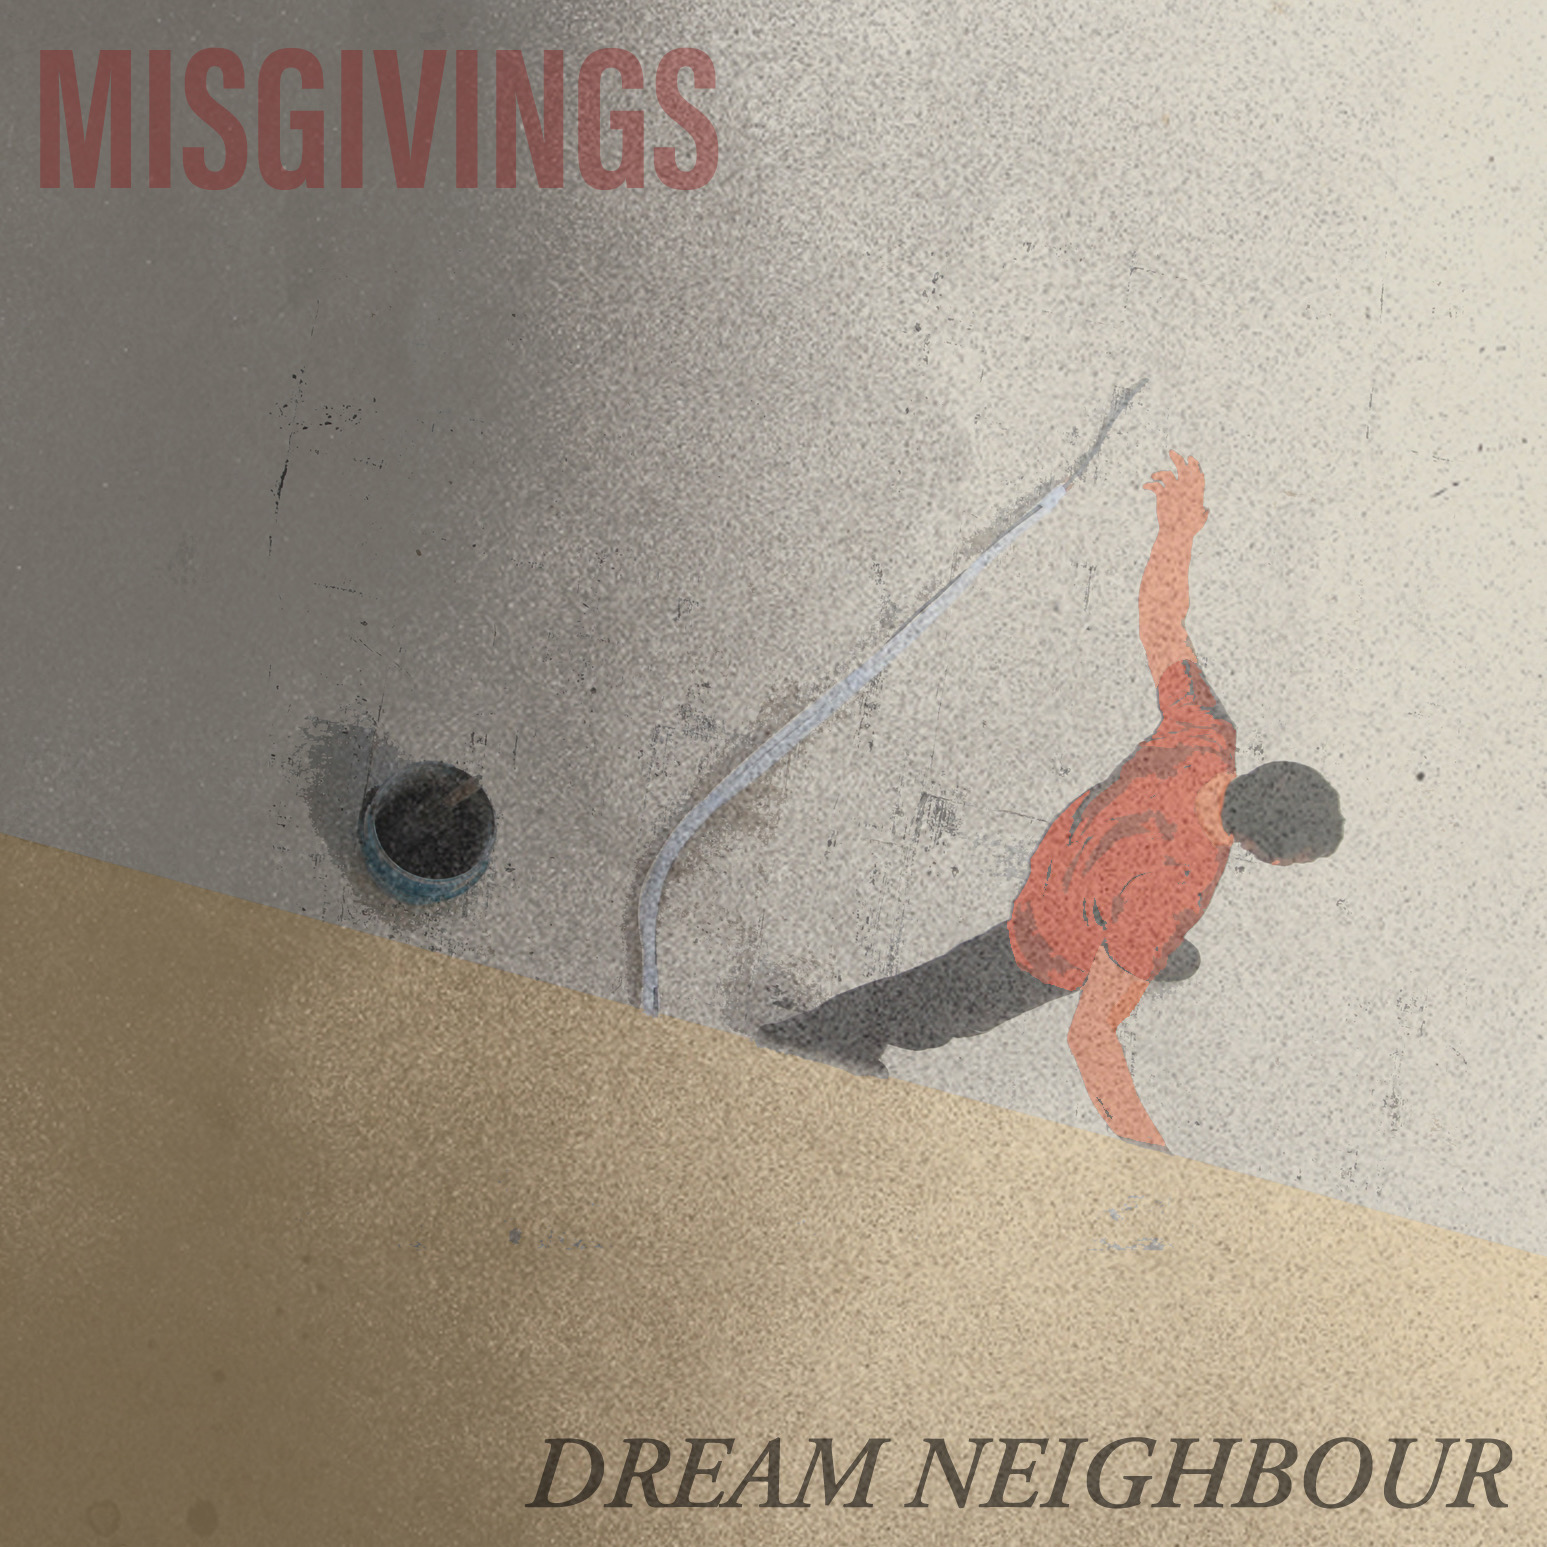 LJDIG205 Misgivings - Dream Neighbour Artwork